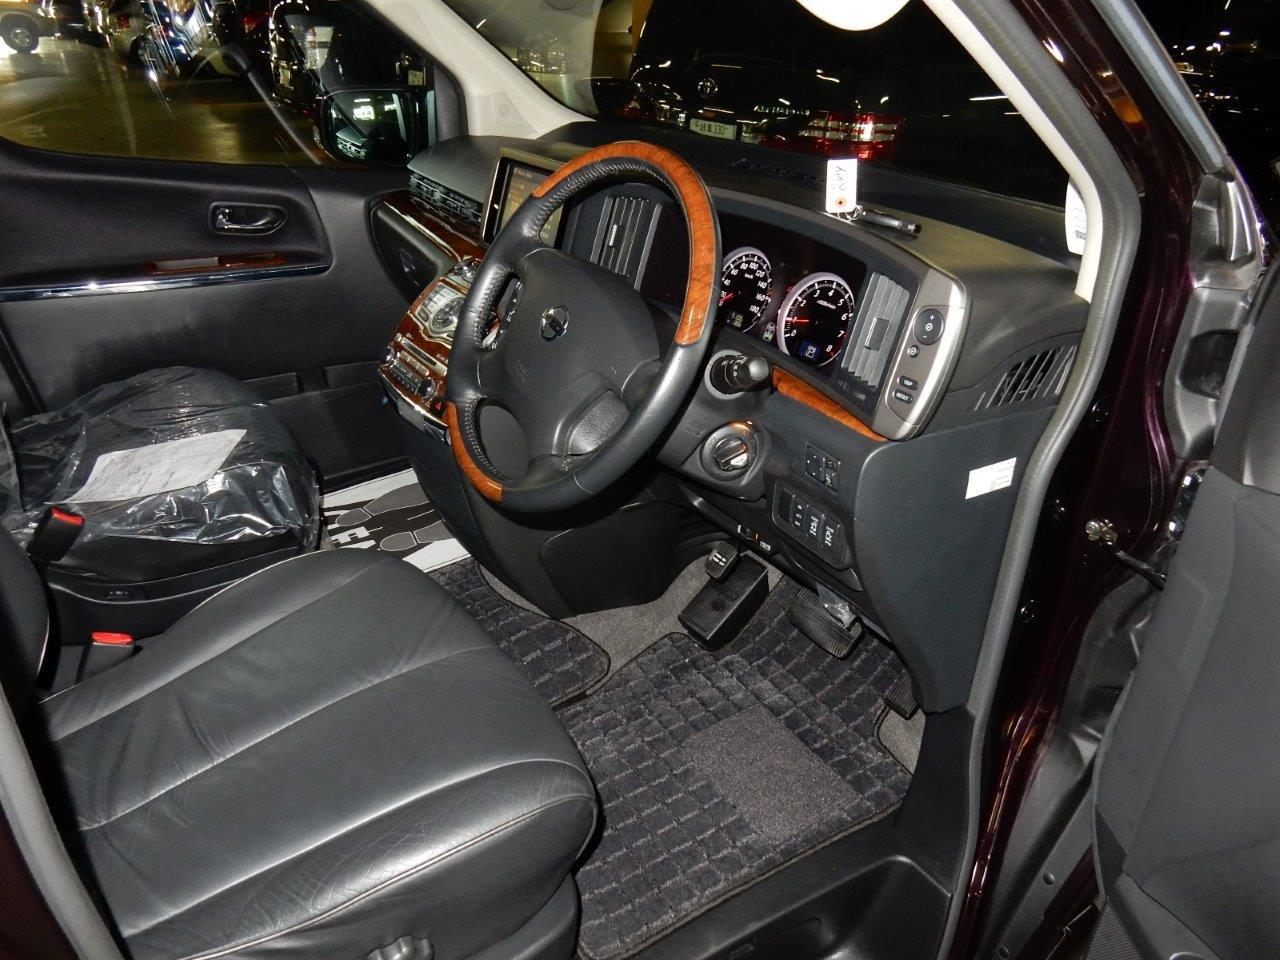 2009 Nissan Elgrand NE51 interior